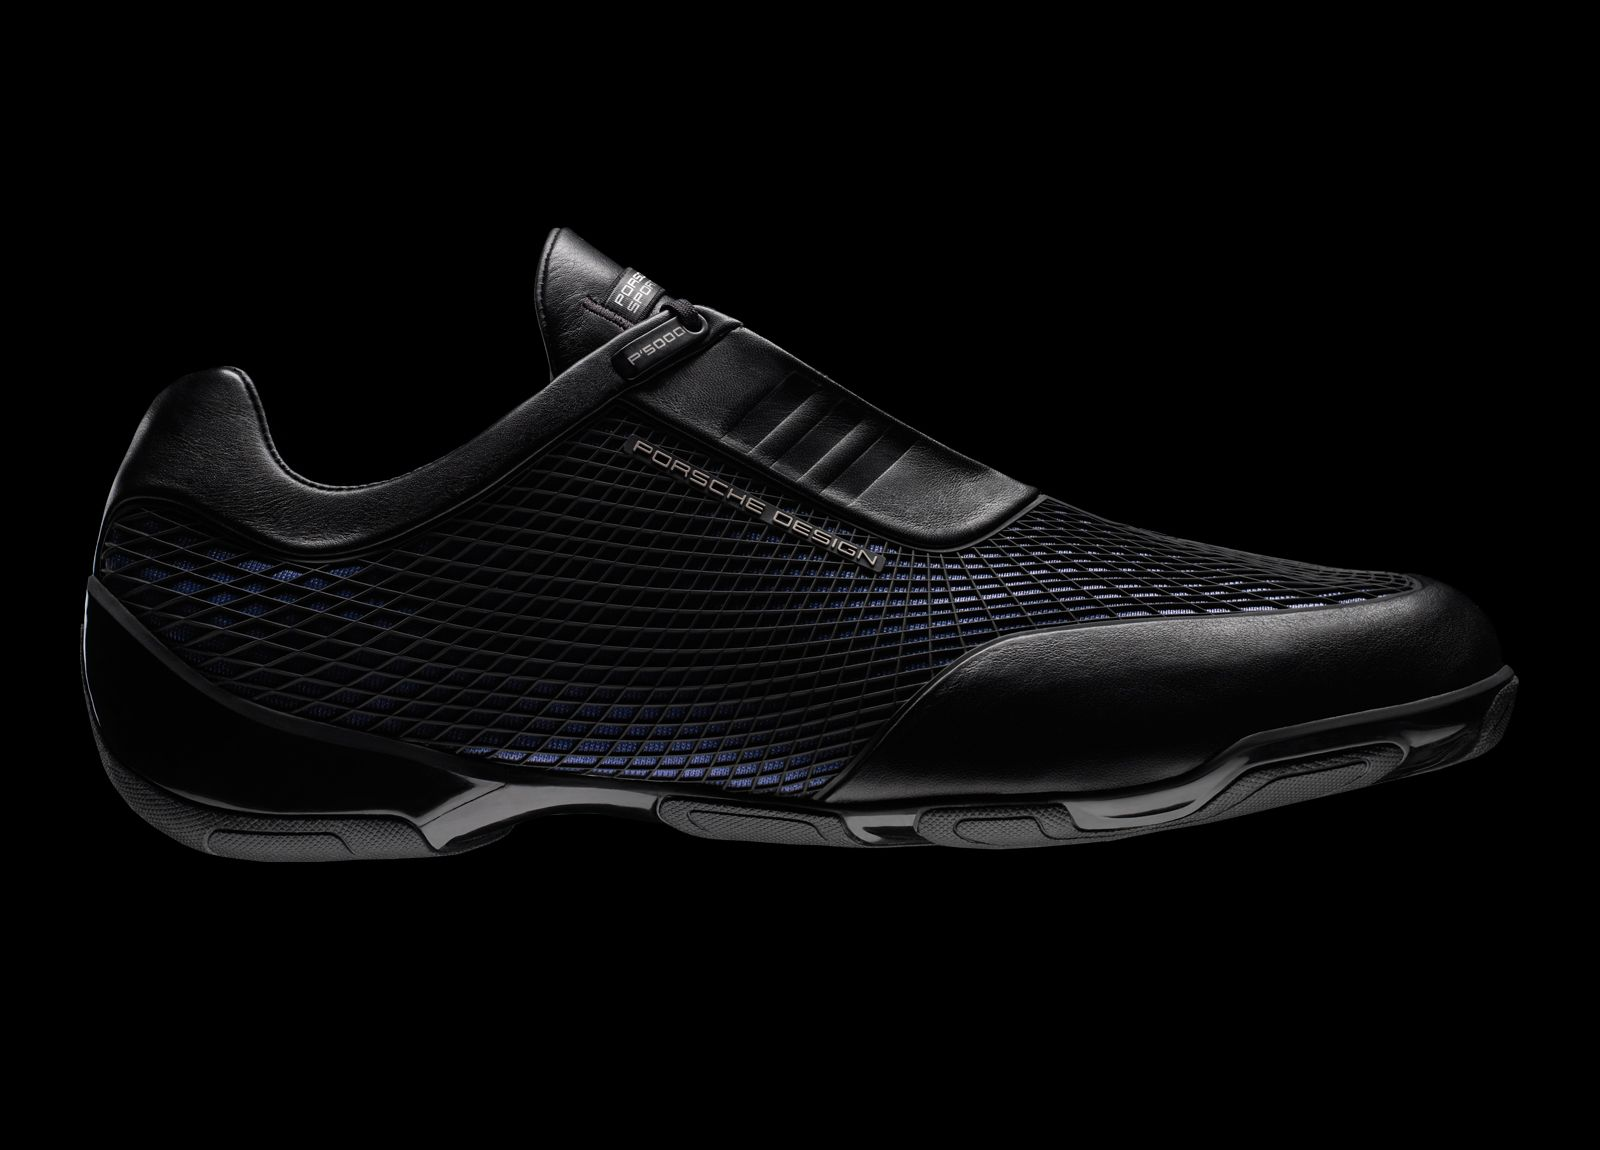 on sale 5ec39 1cfe5 ... usa classic f97b5 53b4f original adidas drive chassis g40395 sneaker porsche  design 08faf cf882